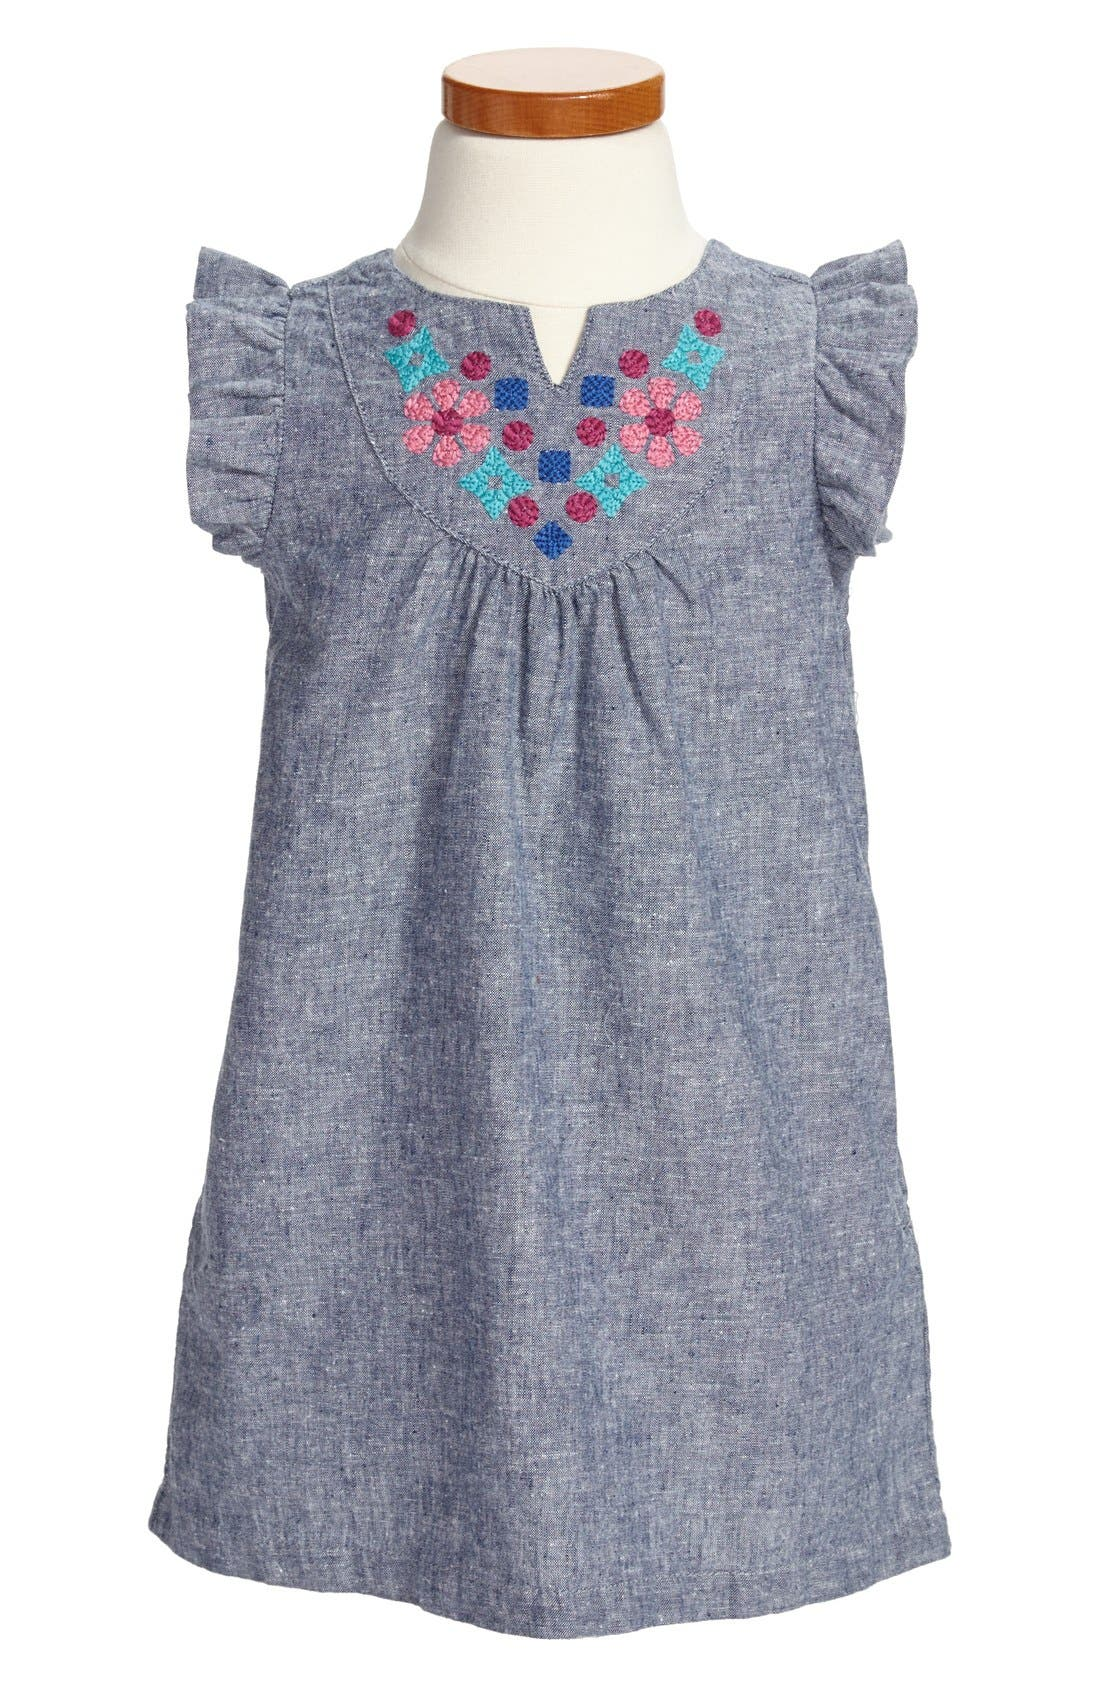 Alternate Image 1 Selected - Tea Collection 'Zidana' Dress (Little Girls & Big Girls)